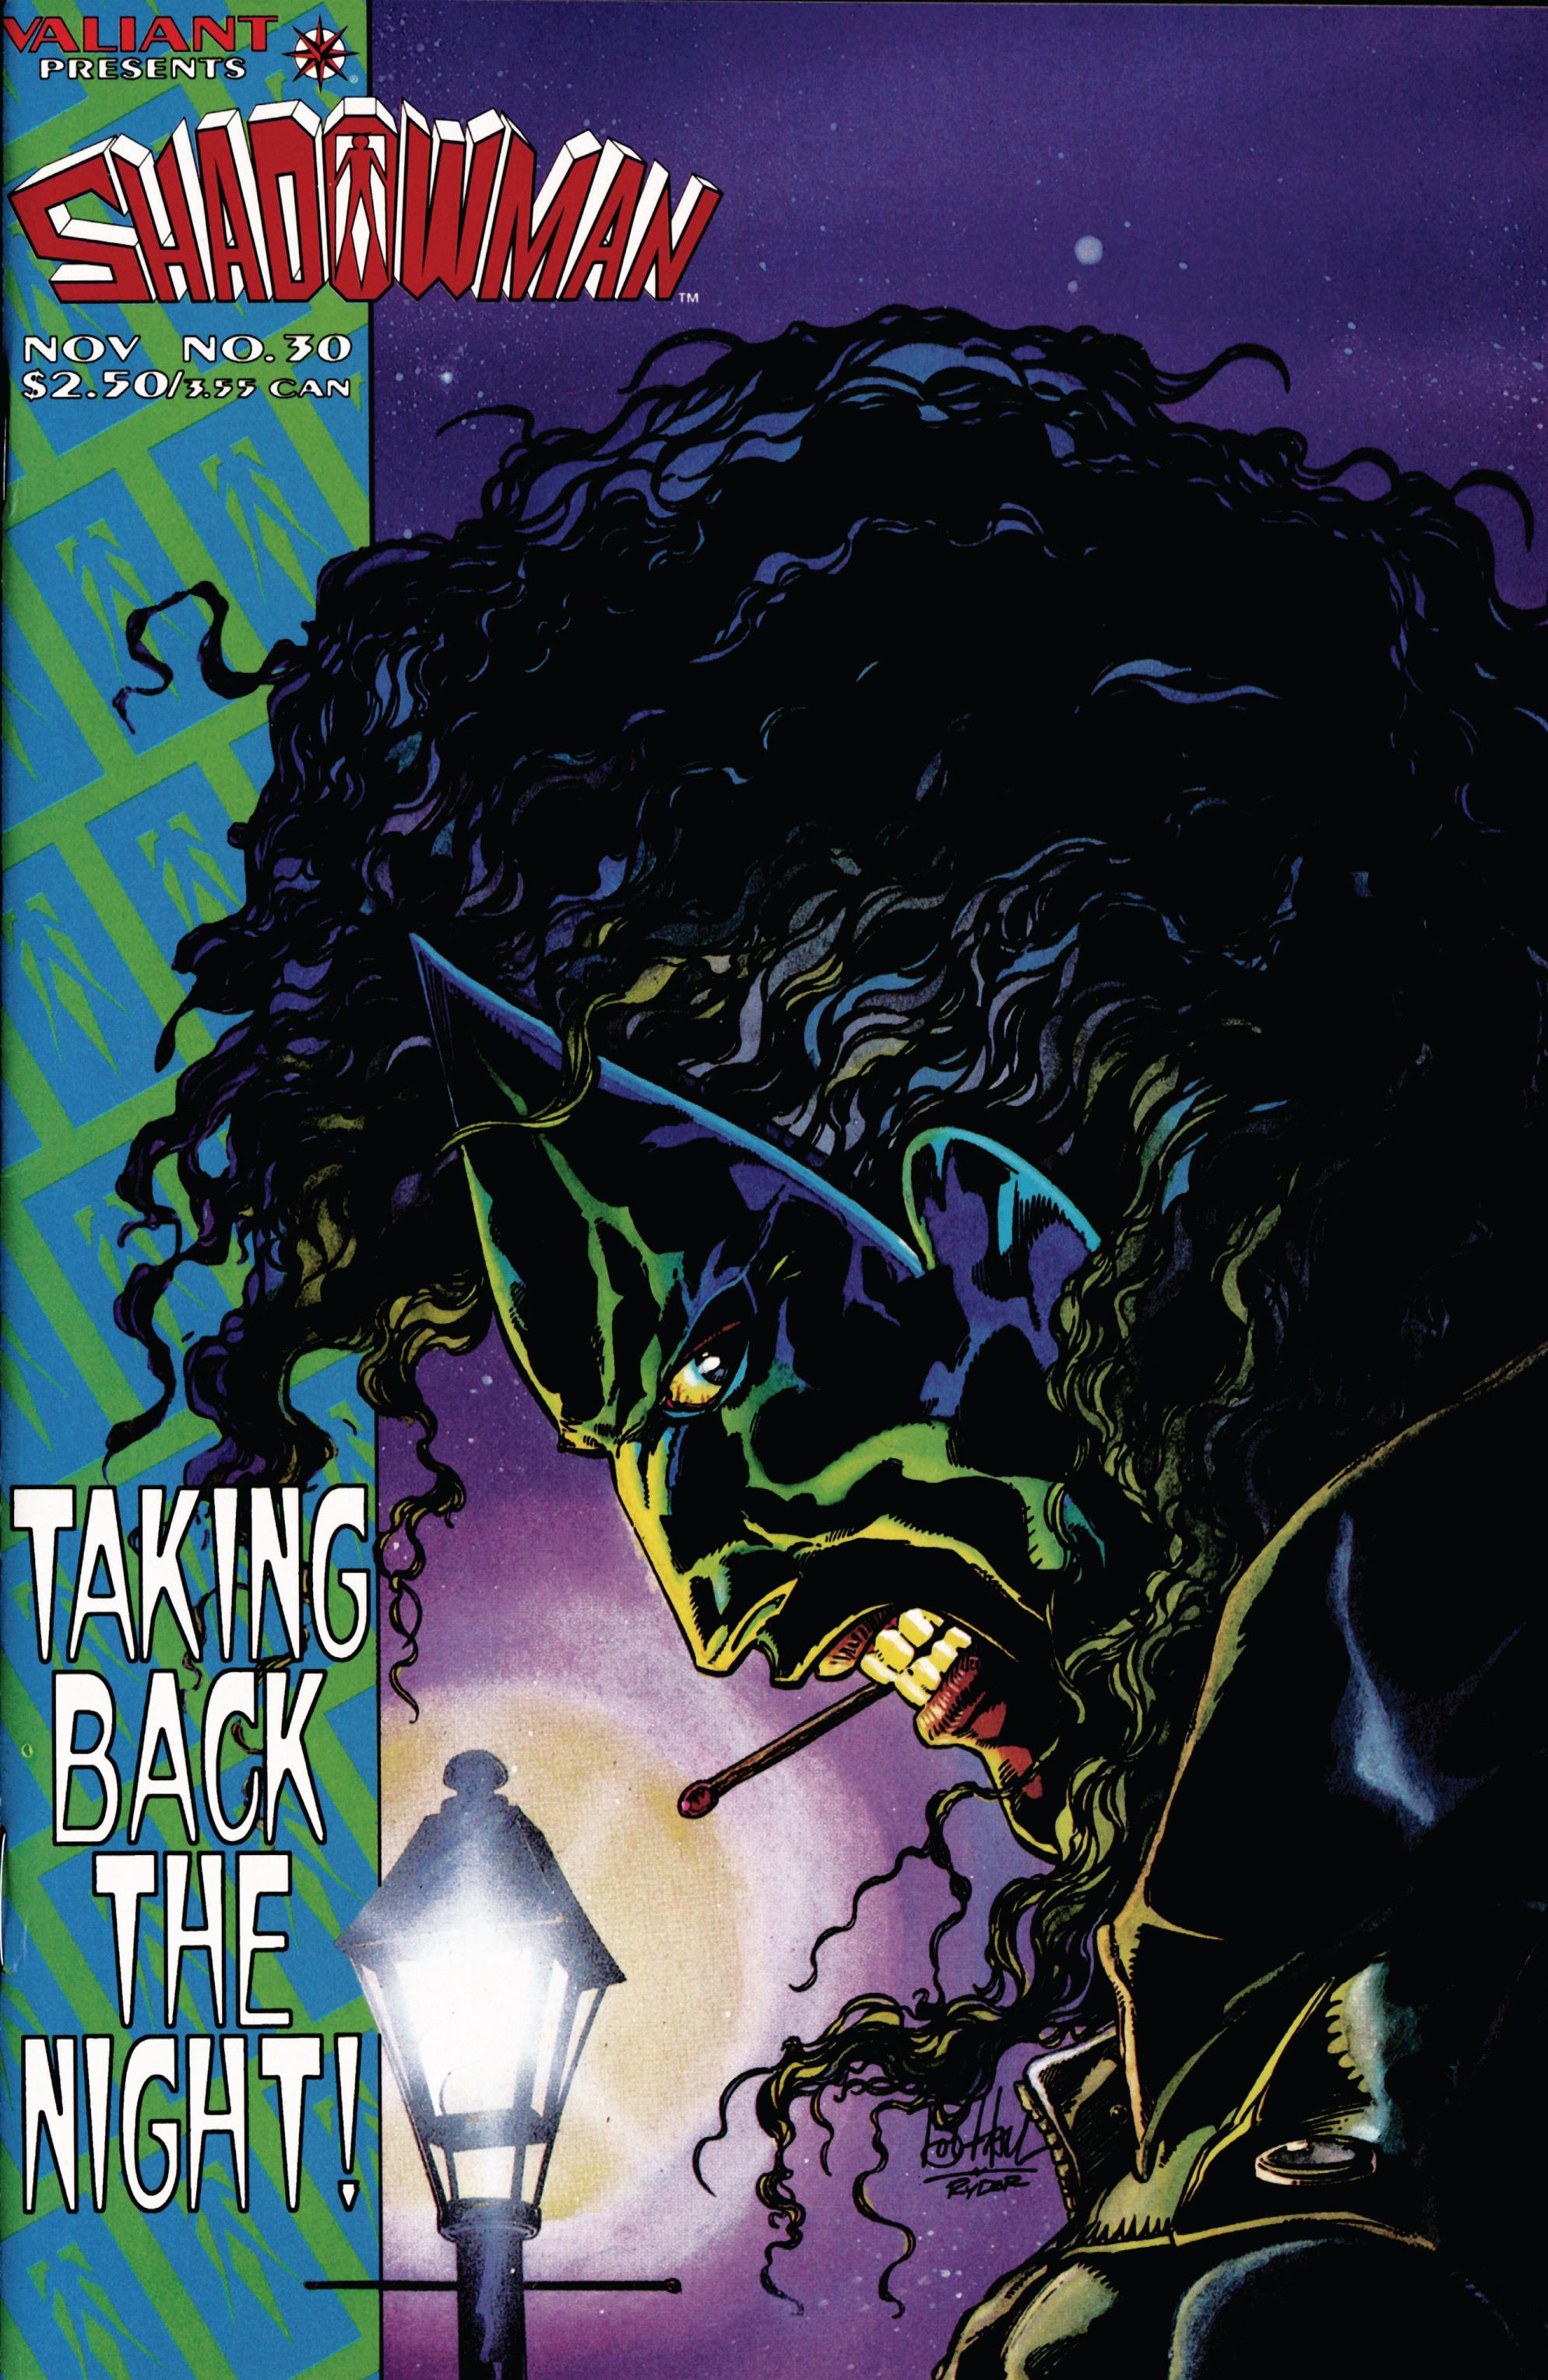 Read online Shadowman (1992) comic -  Issue #30 - 1